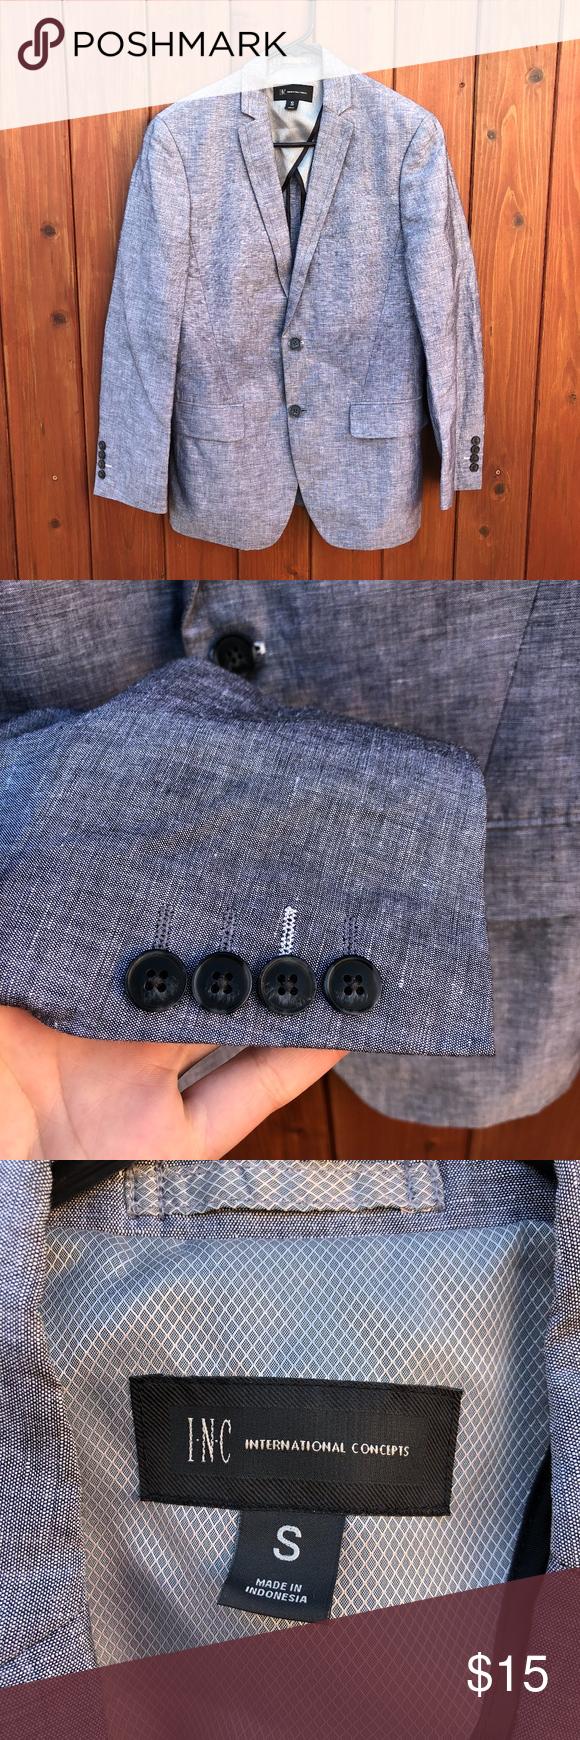 INC International Concepts Gray Blazer/Sports Coat Shell